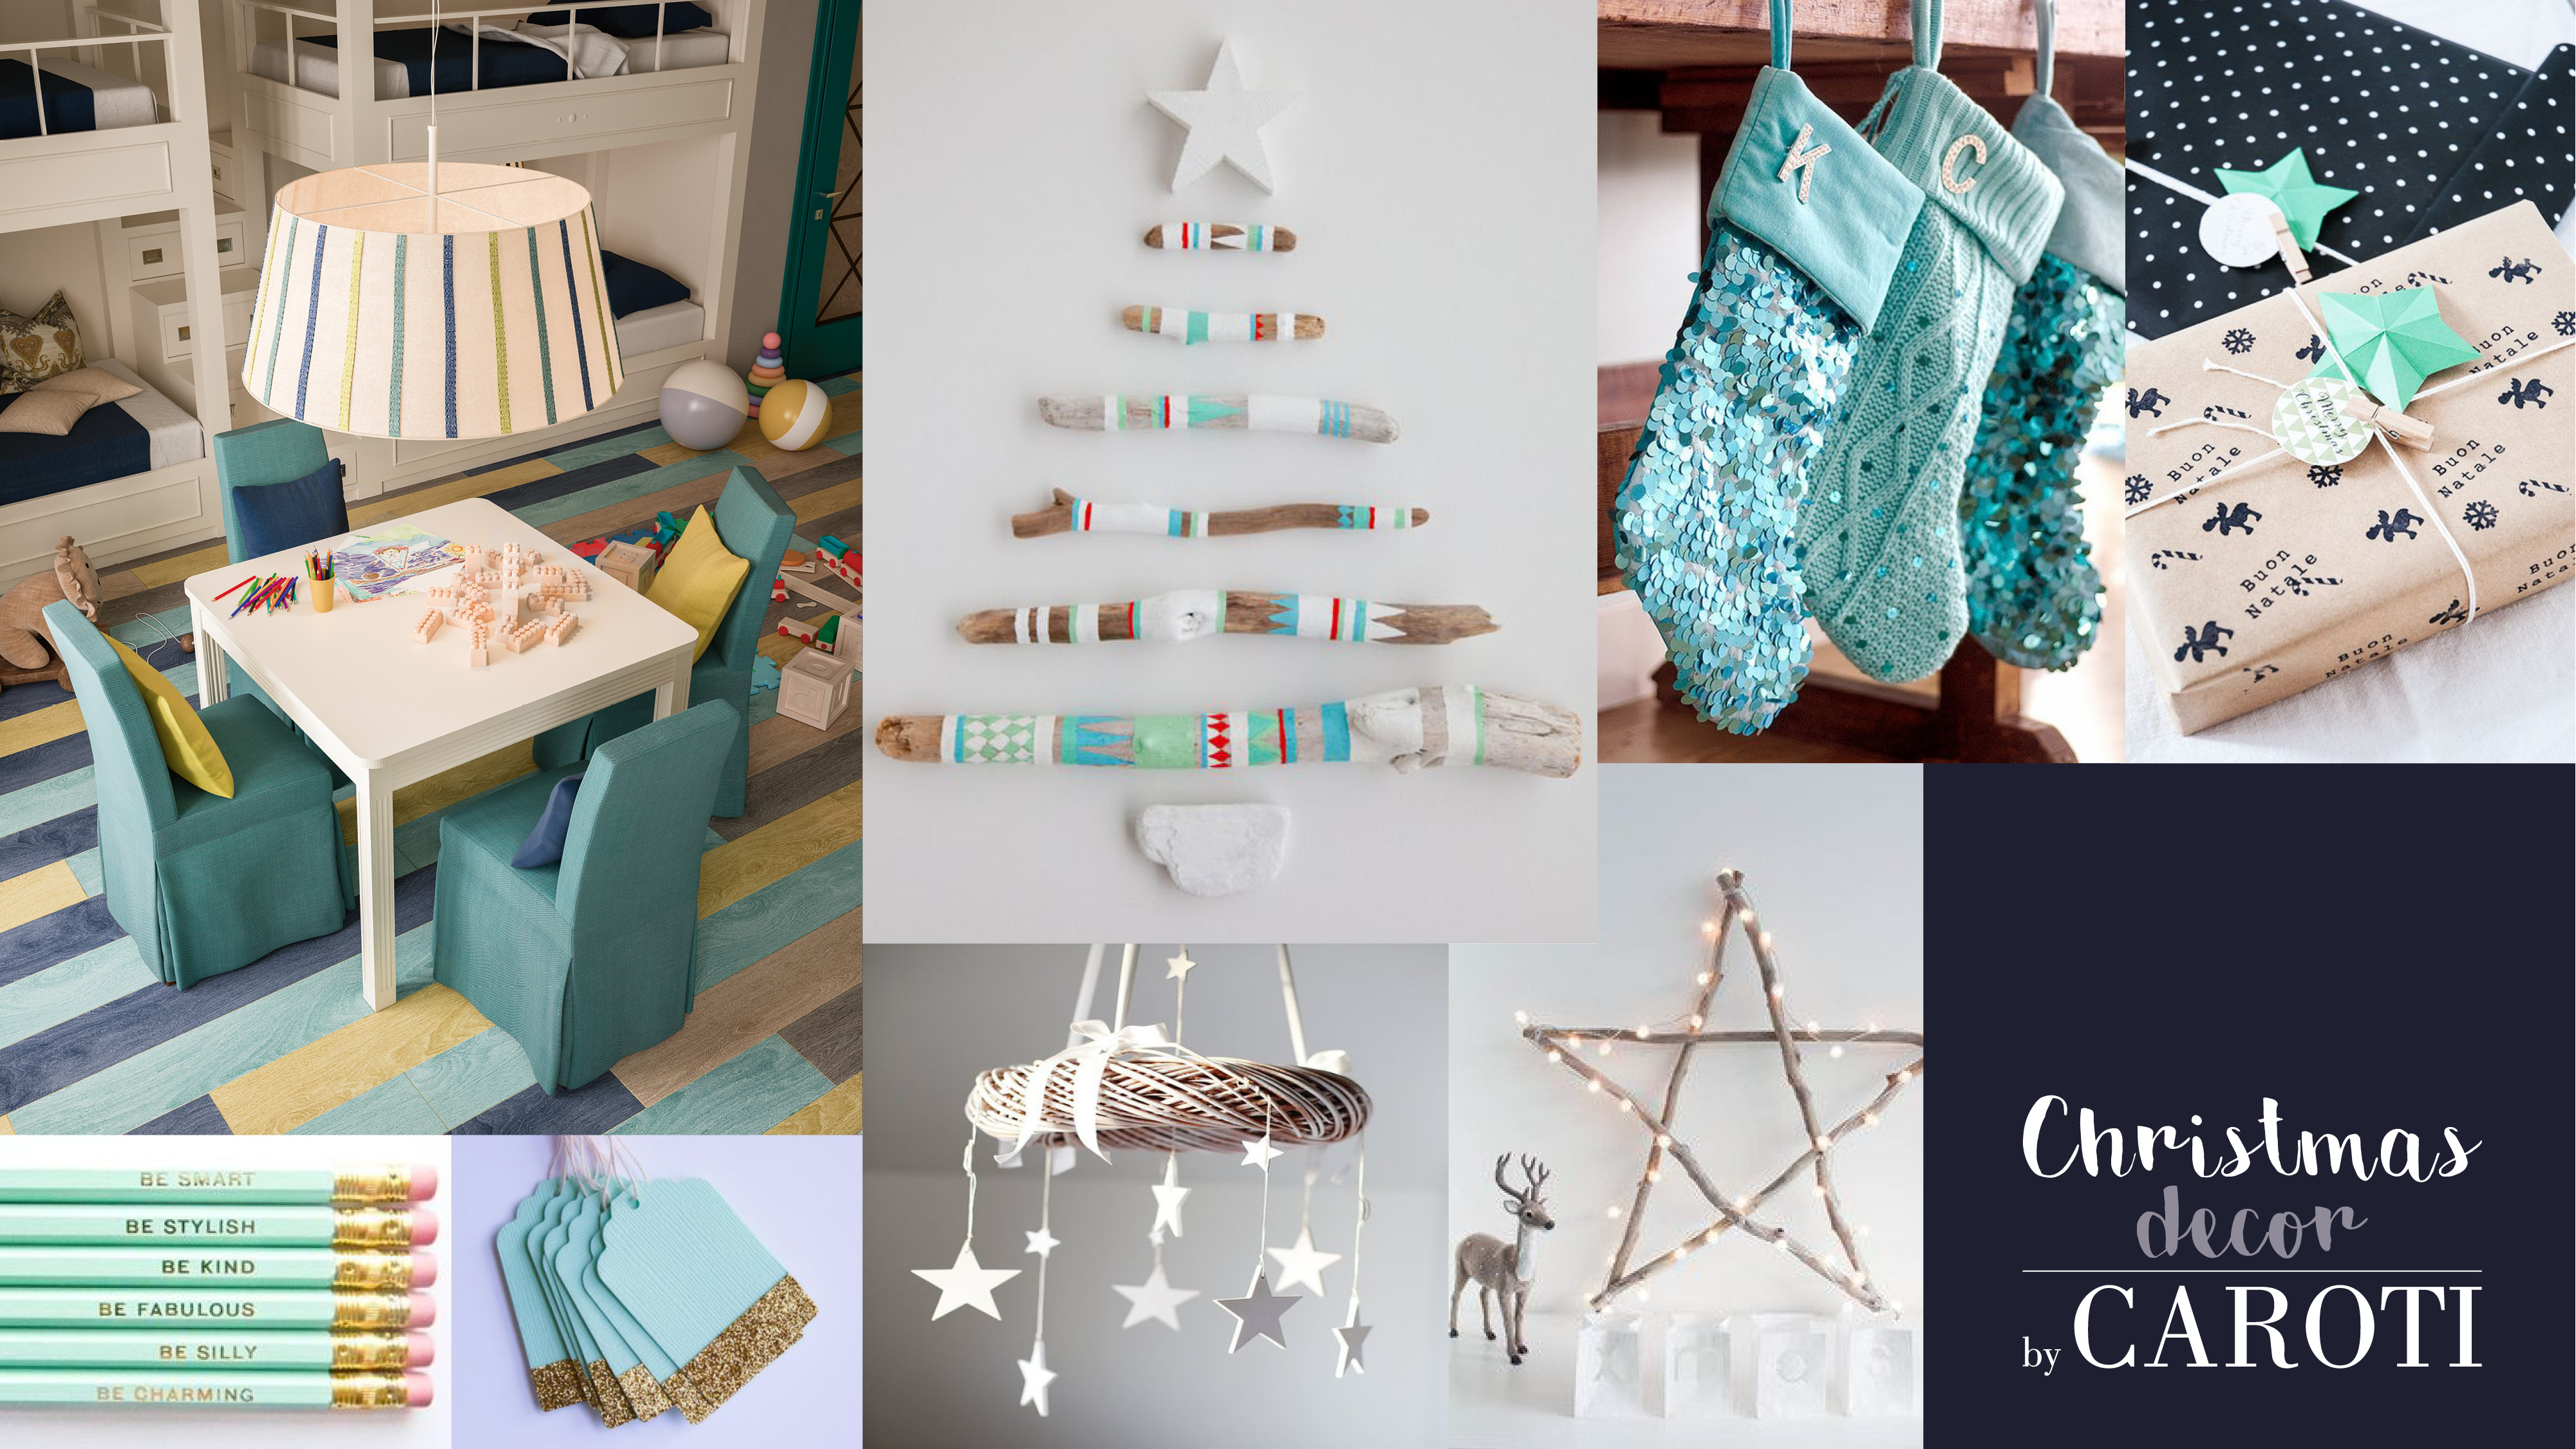 christmas decor ideas by caroti in scandinavian style tiffany #2